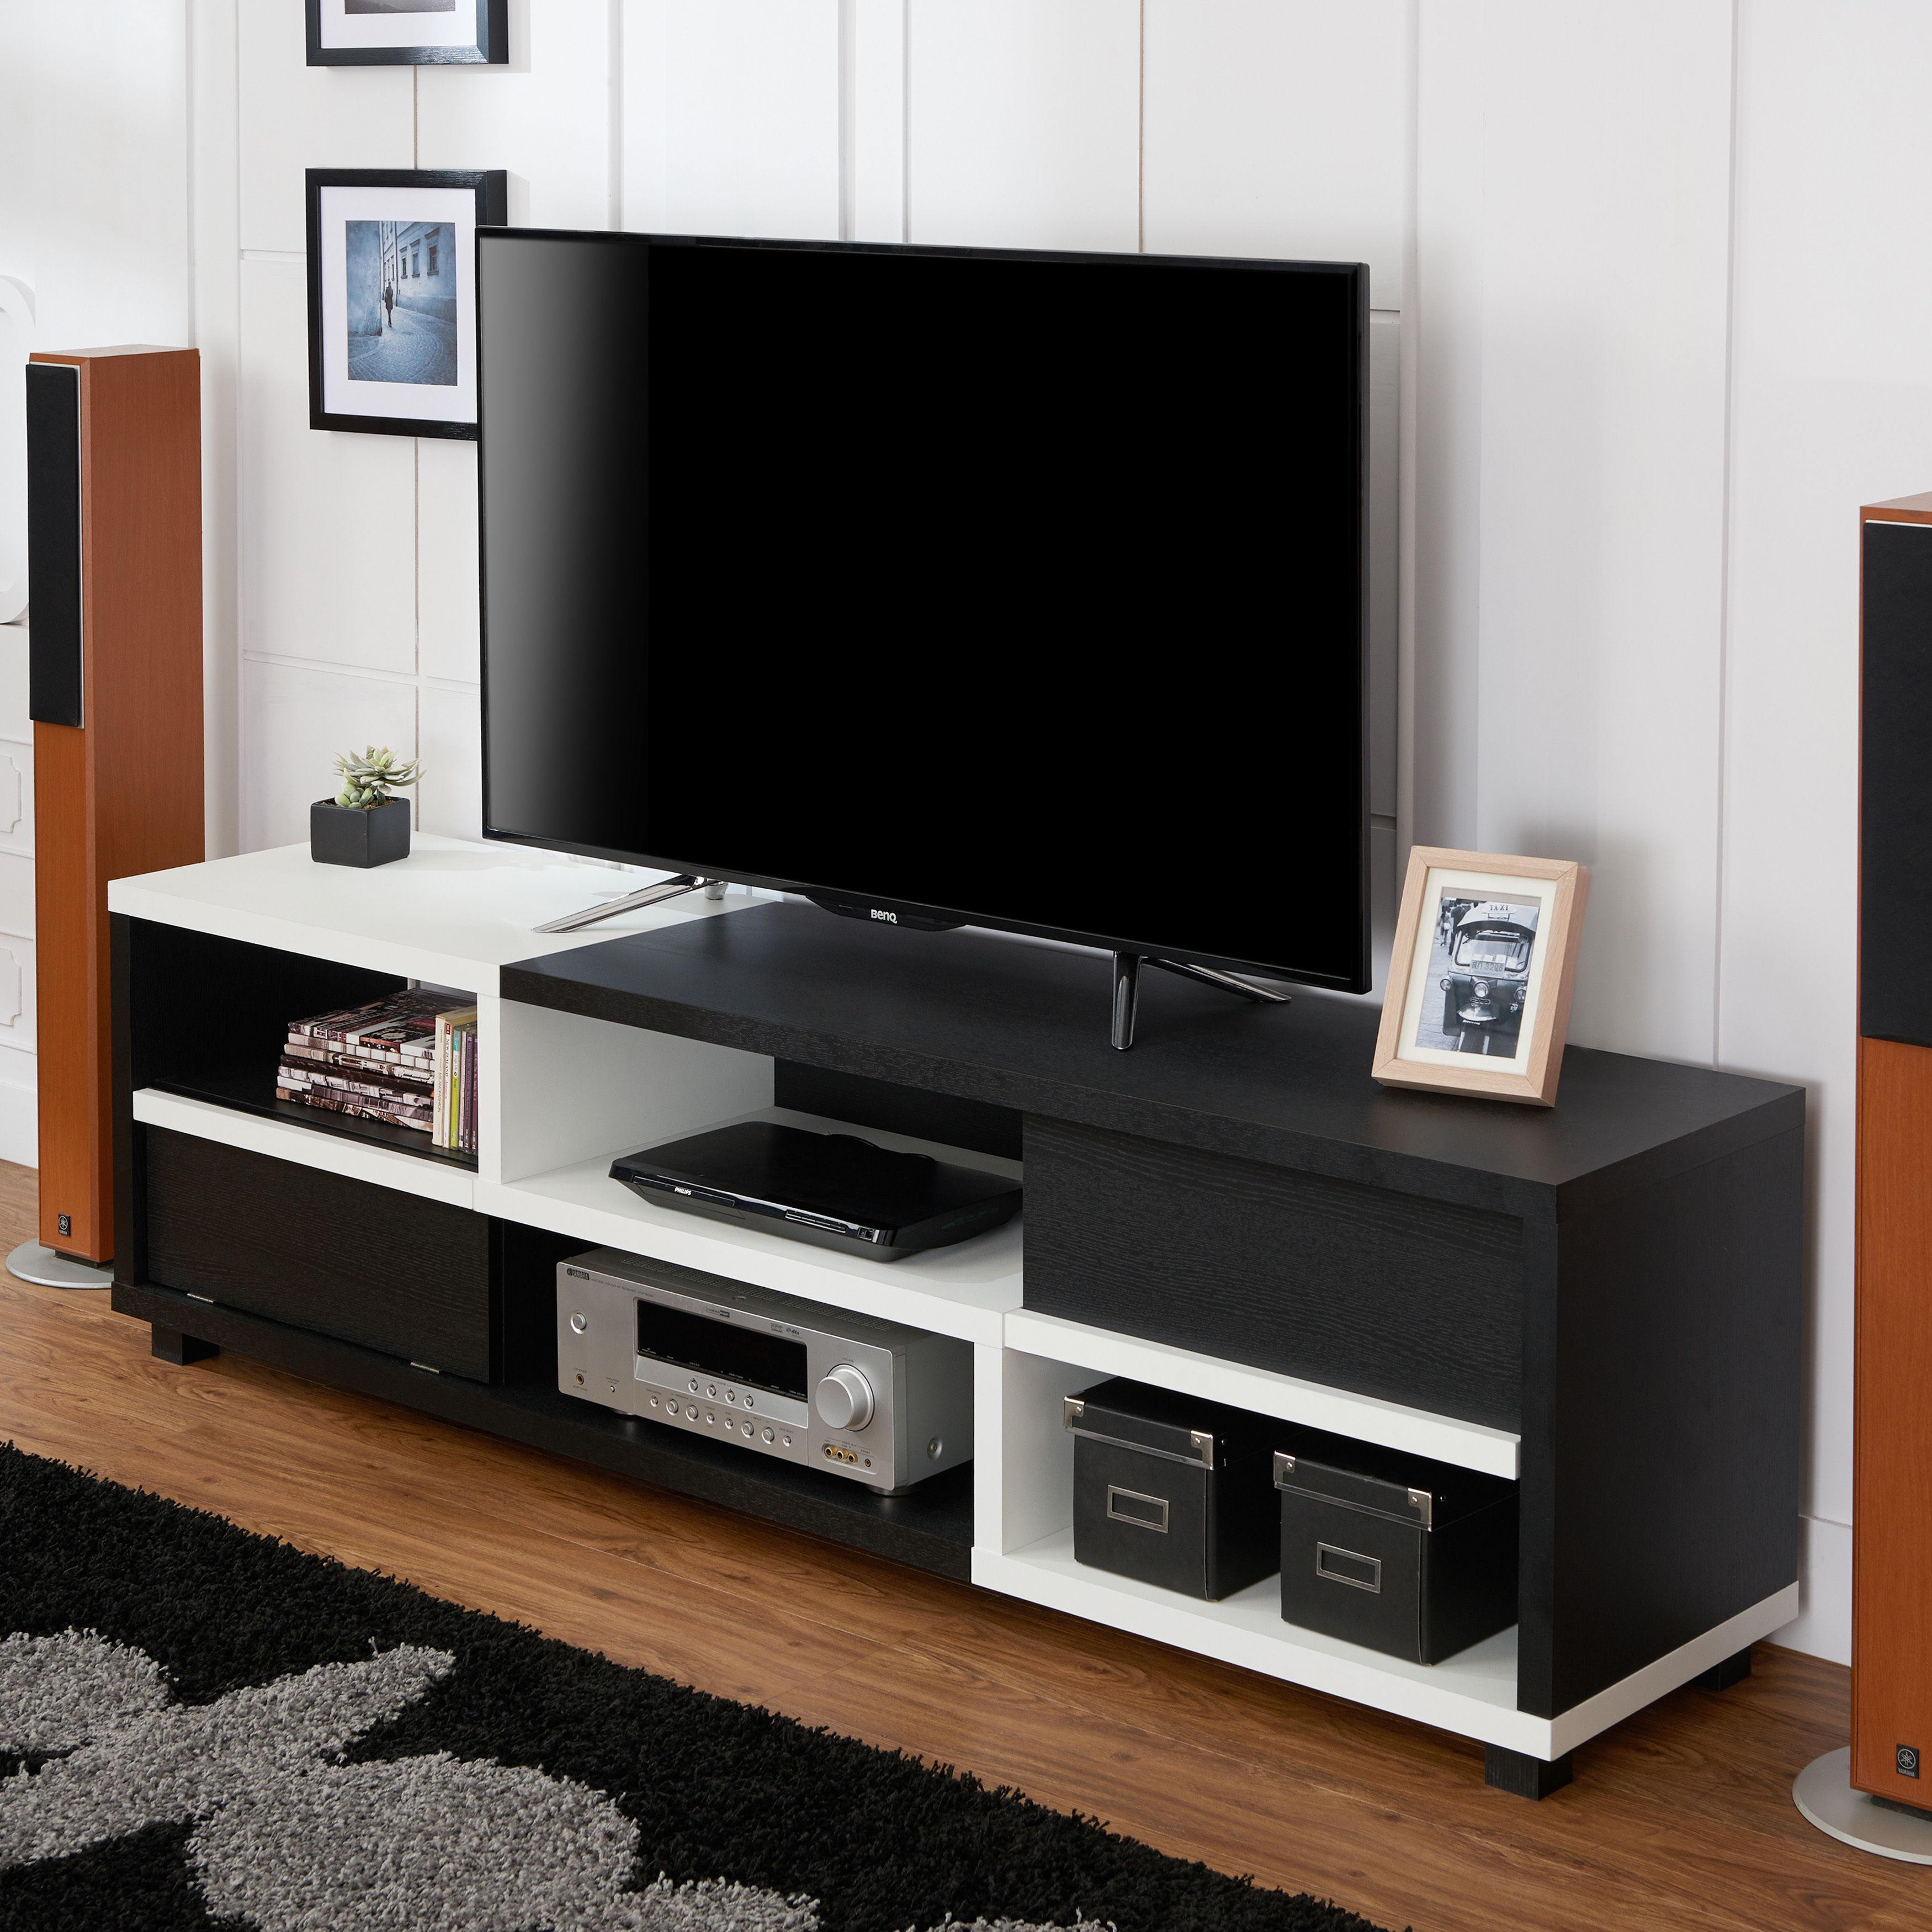 Furniture Of America Curie Modern Two Tone 70 Inch Tv Stand Black